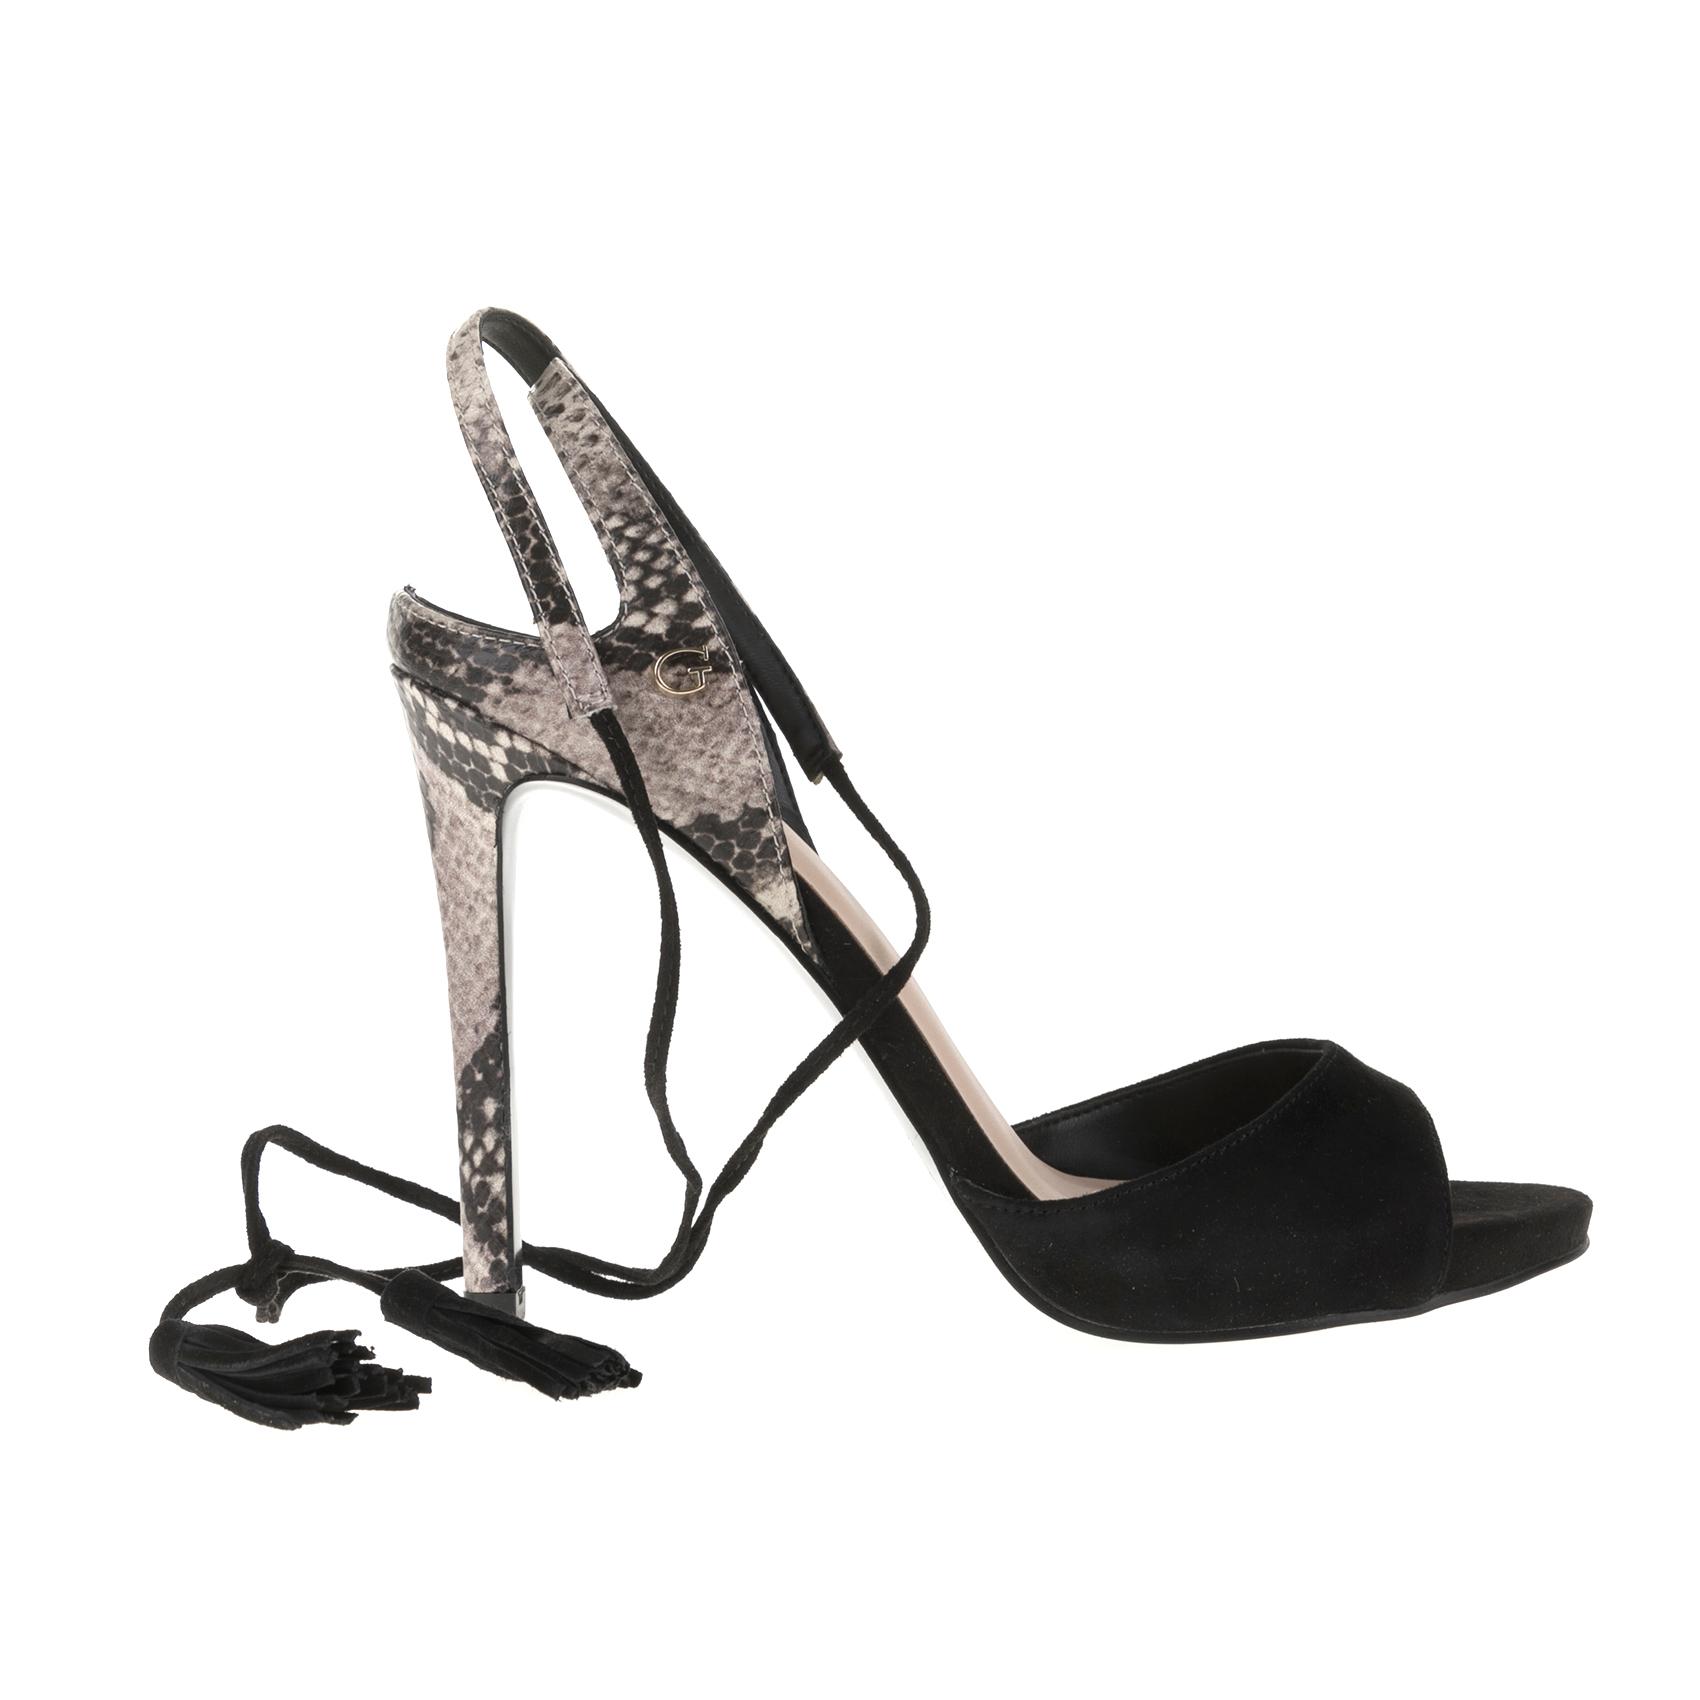 GUESS - Γυναικεία πέδιλα GUESS μαύρα - IFY Shoes e2631c6bc82